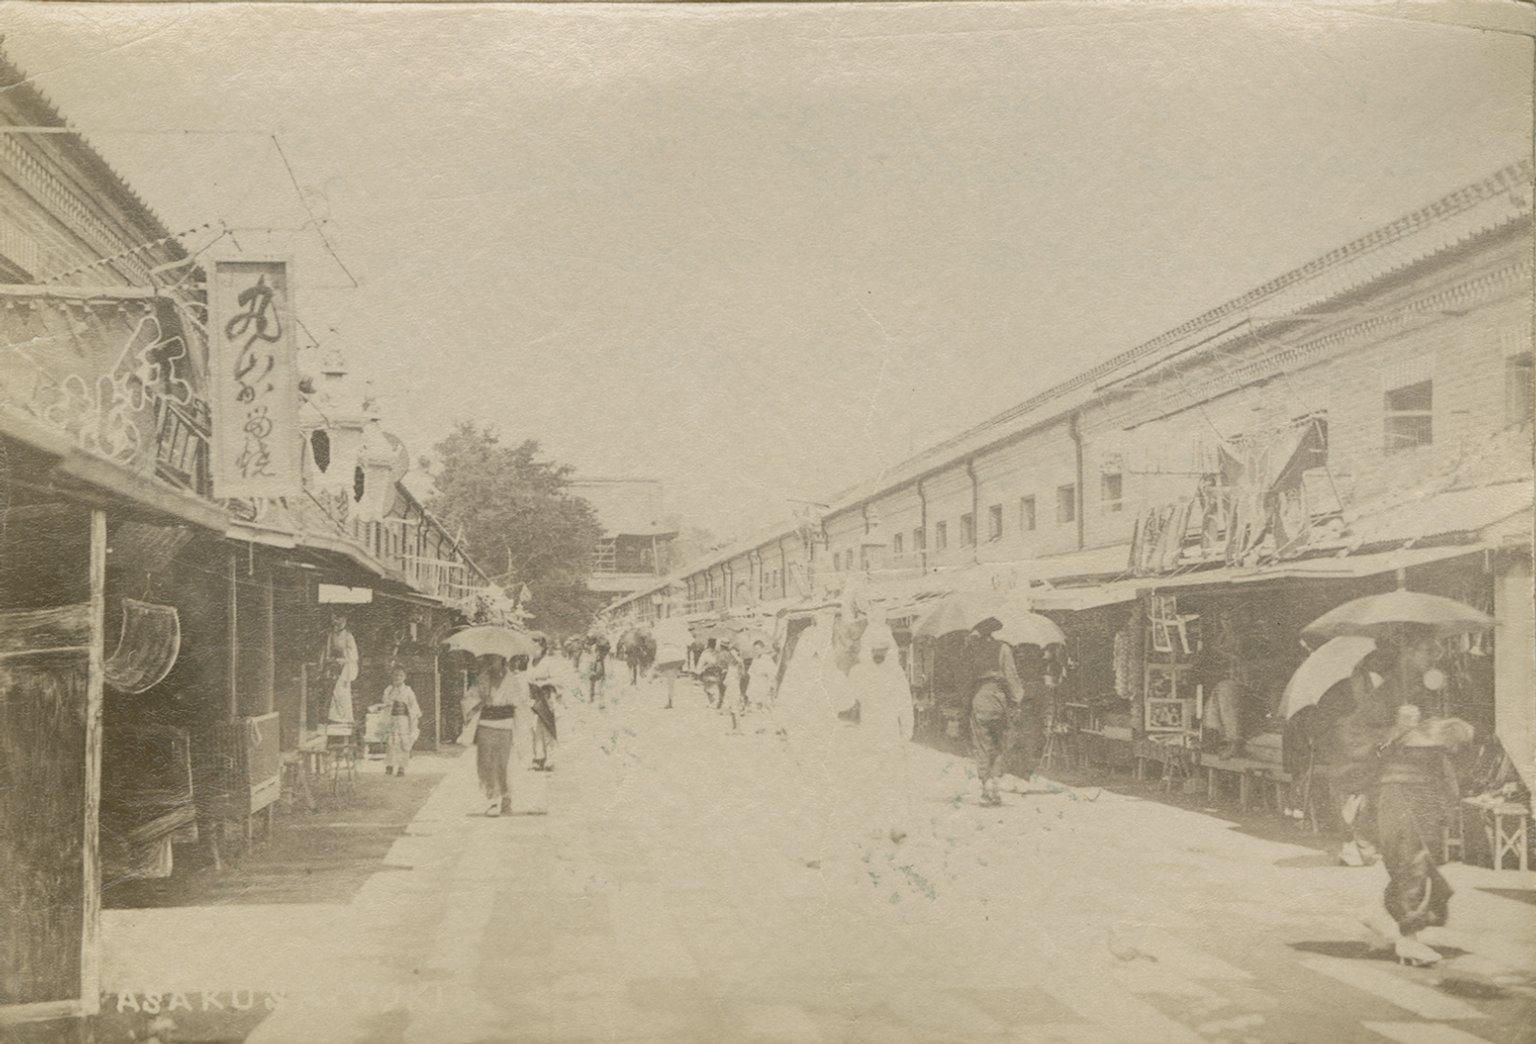 Bazaar street in the Asakusa district, Tokyo